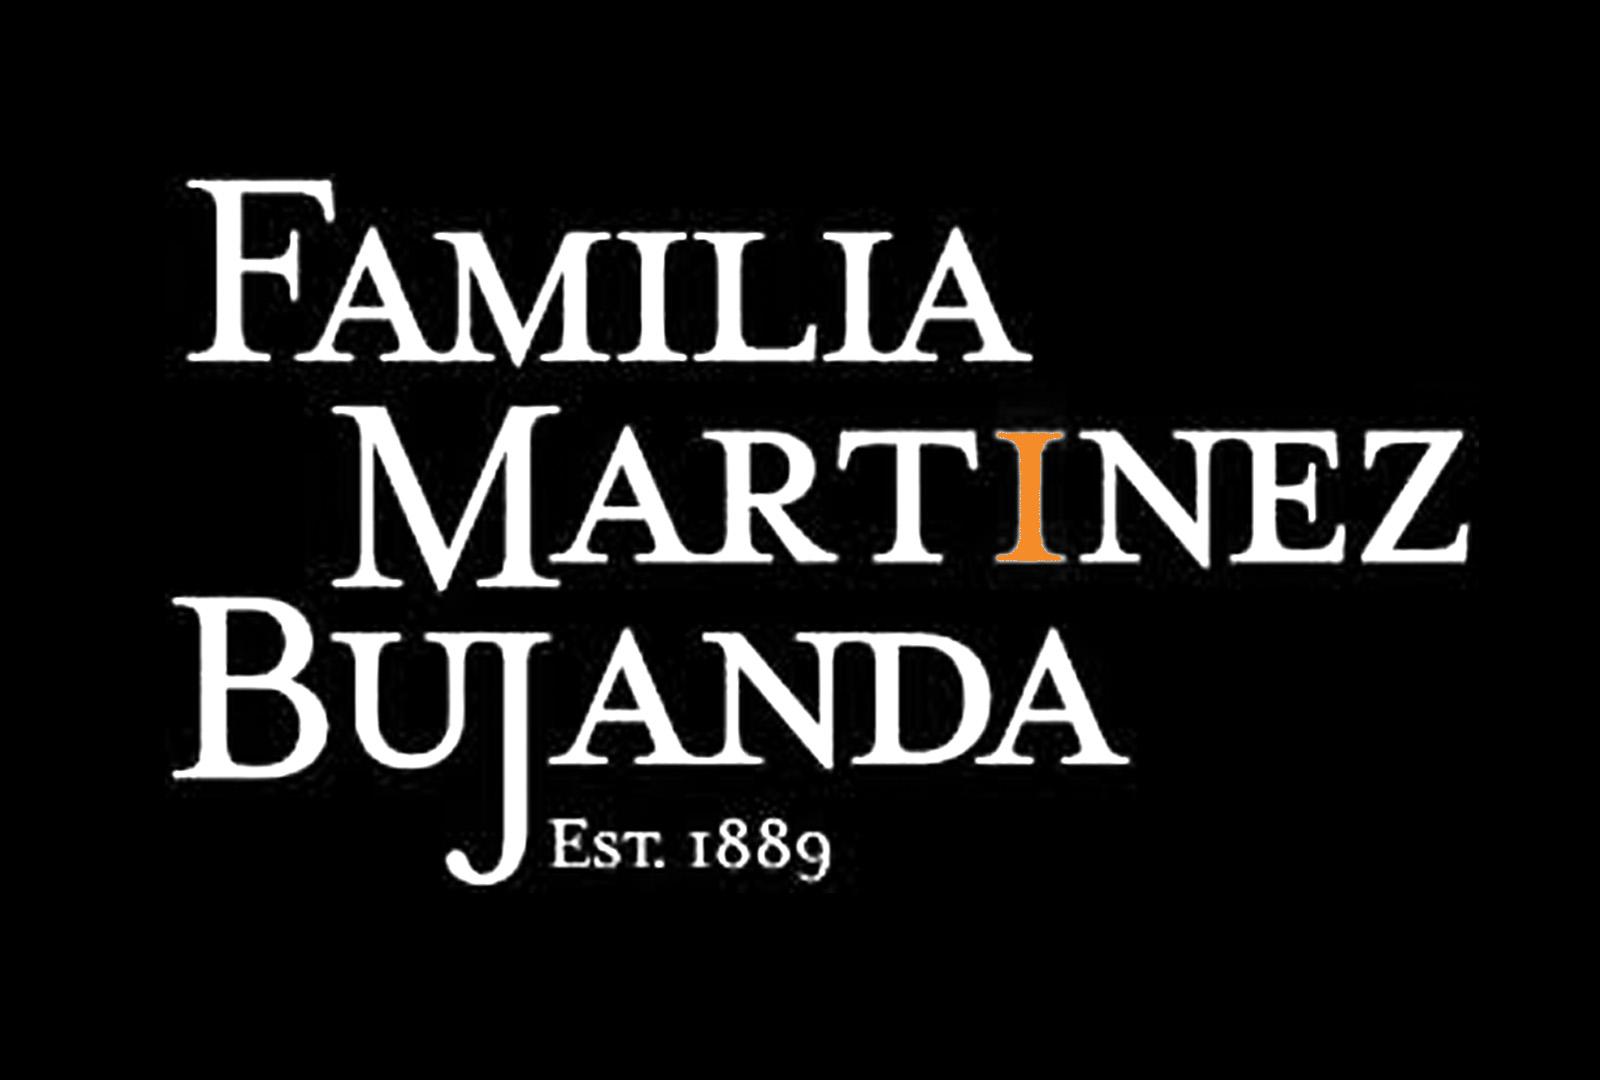 Familia Martínez Bujanda participa en ProWein 2016.